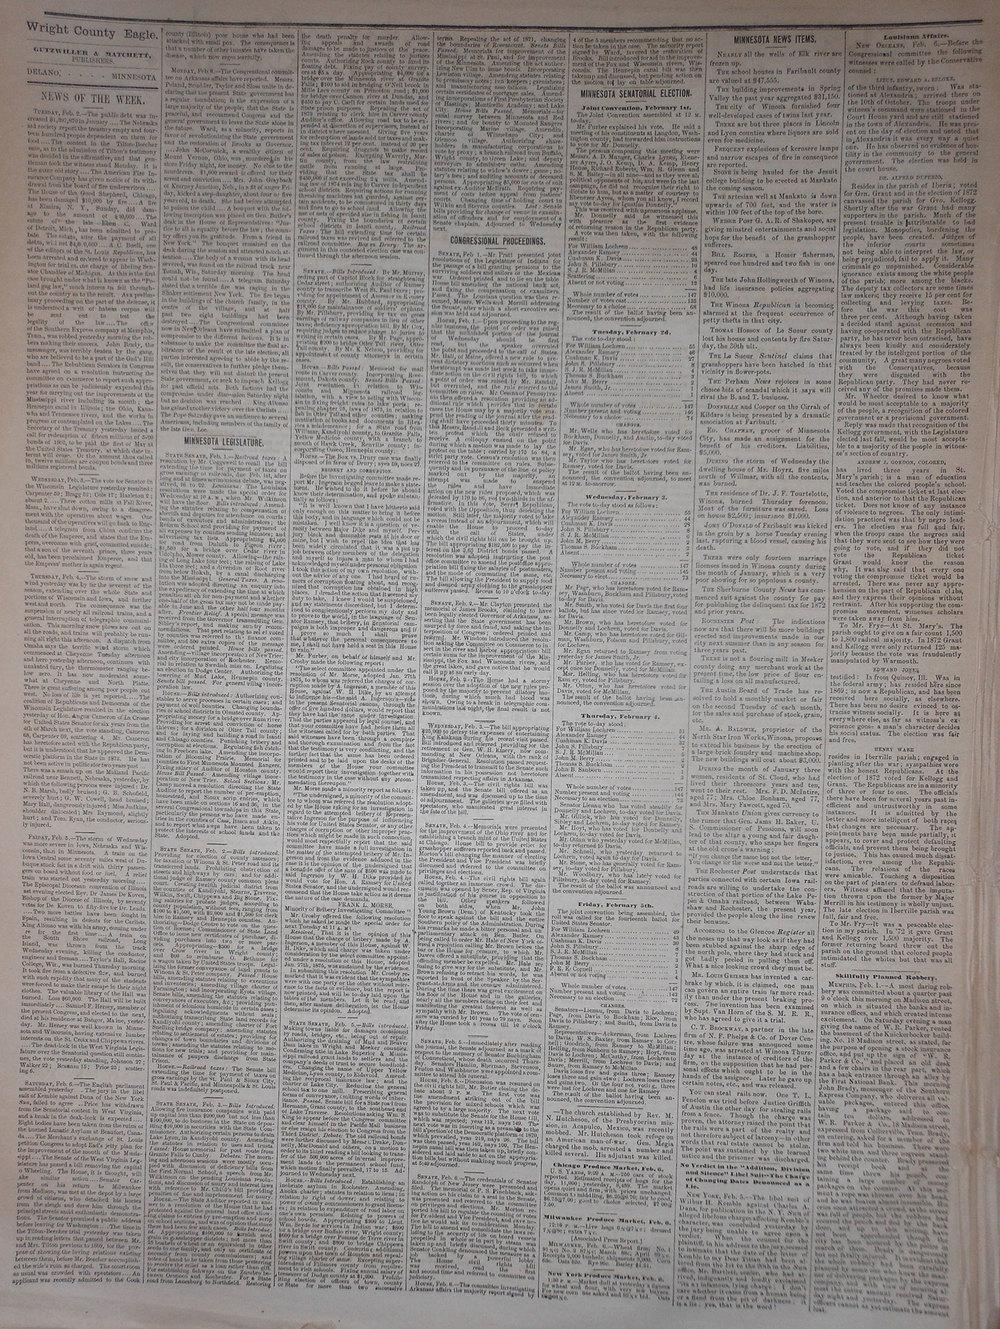 2/10/1875, p2